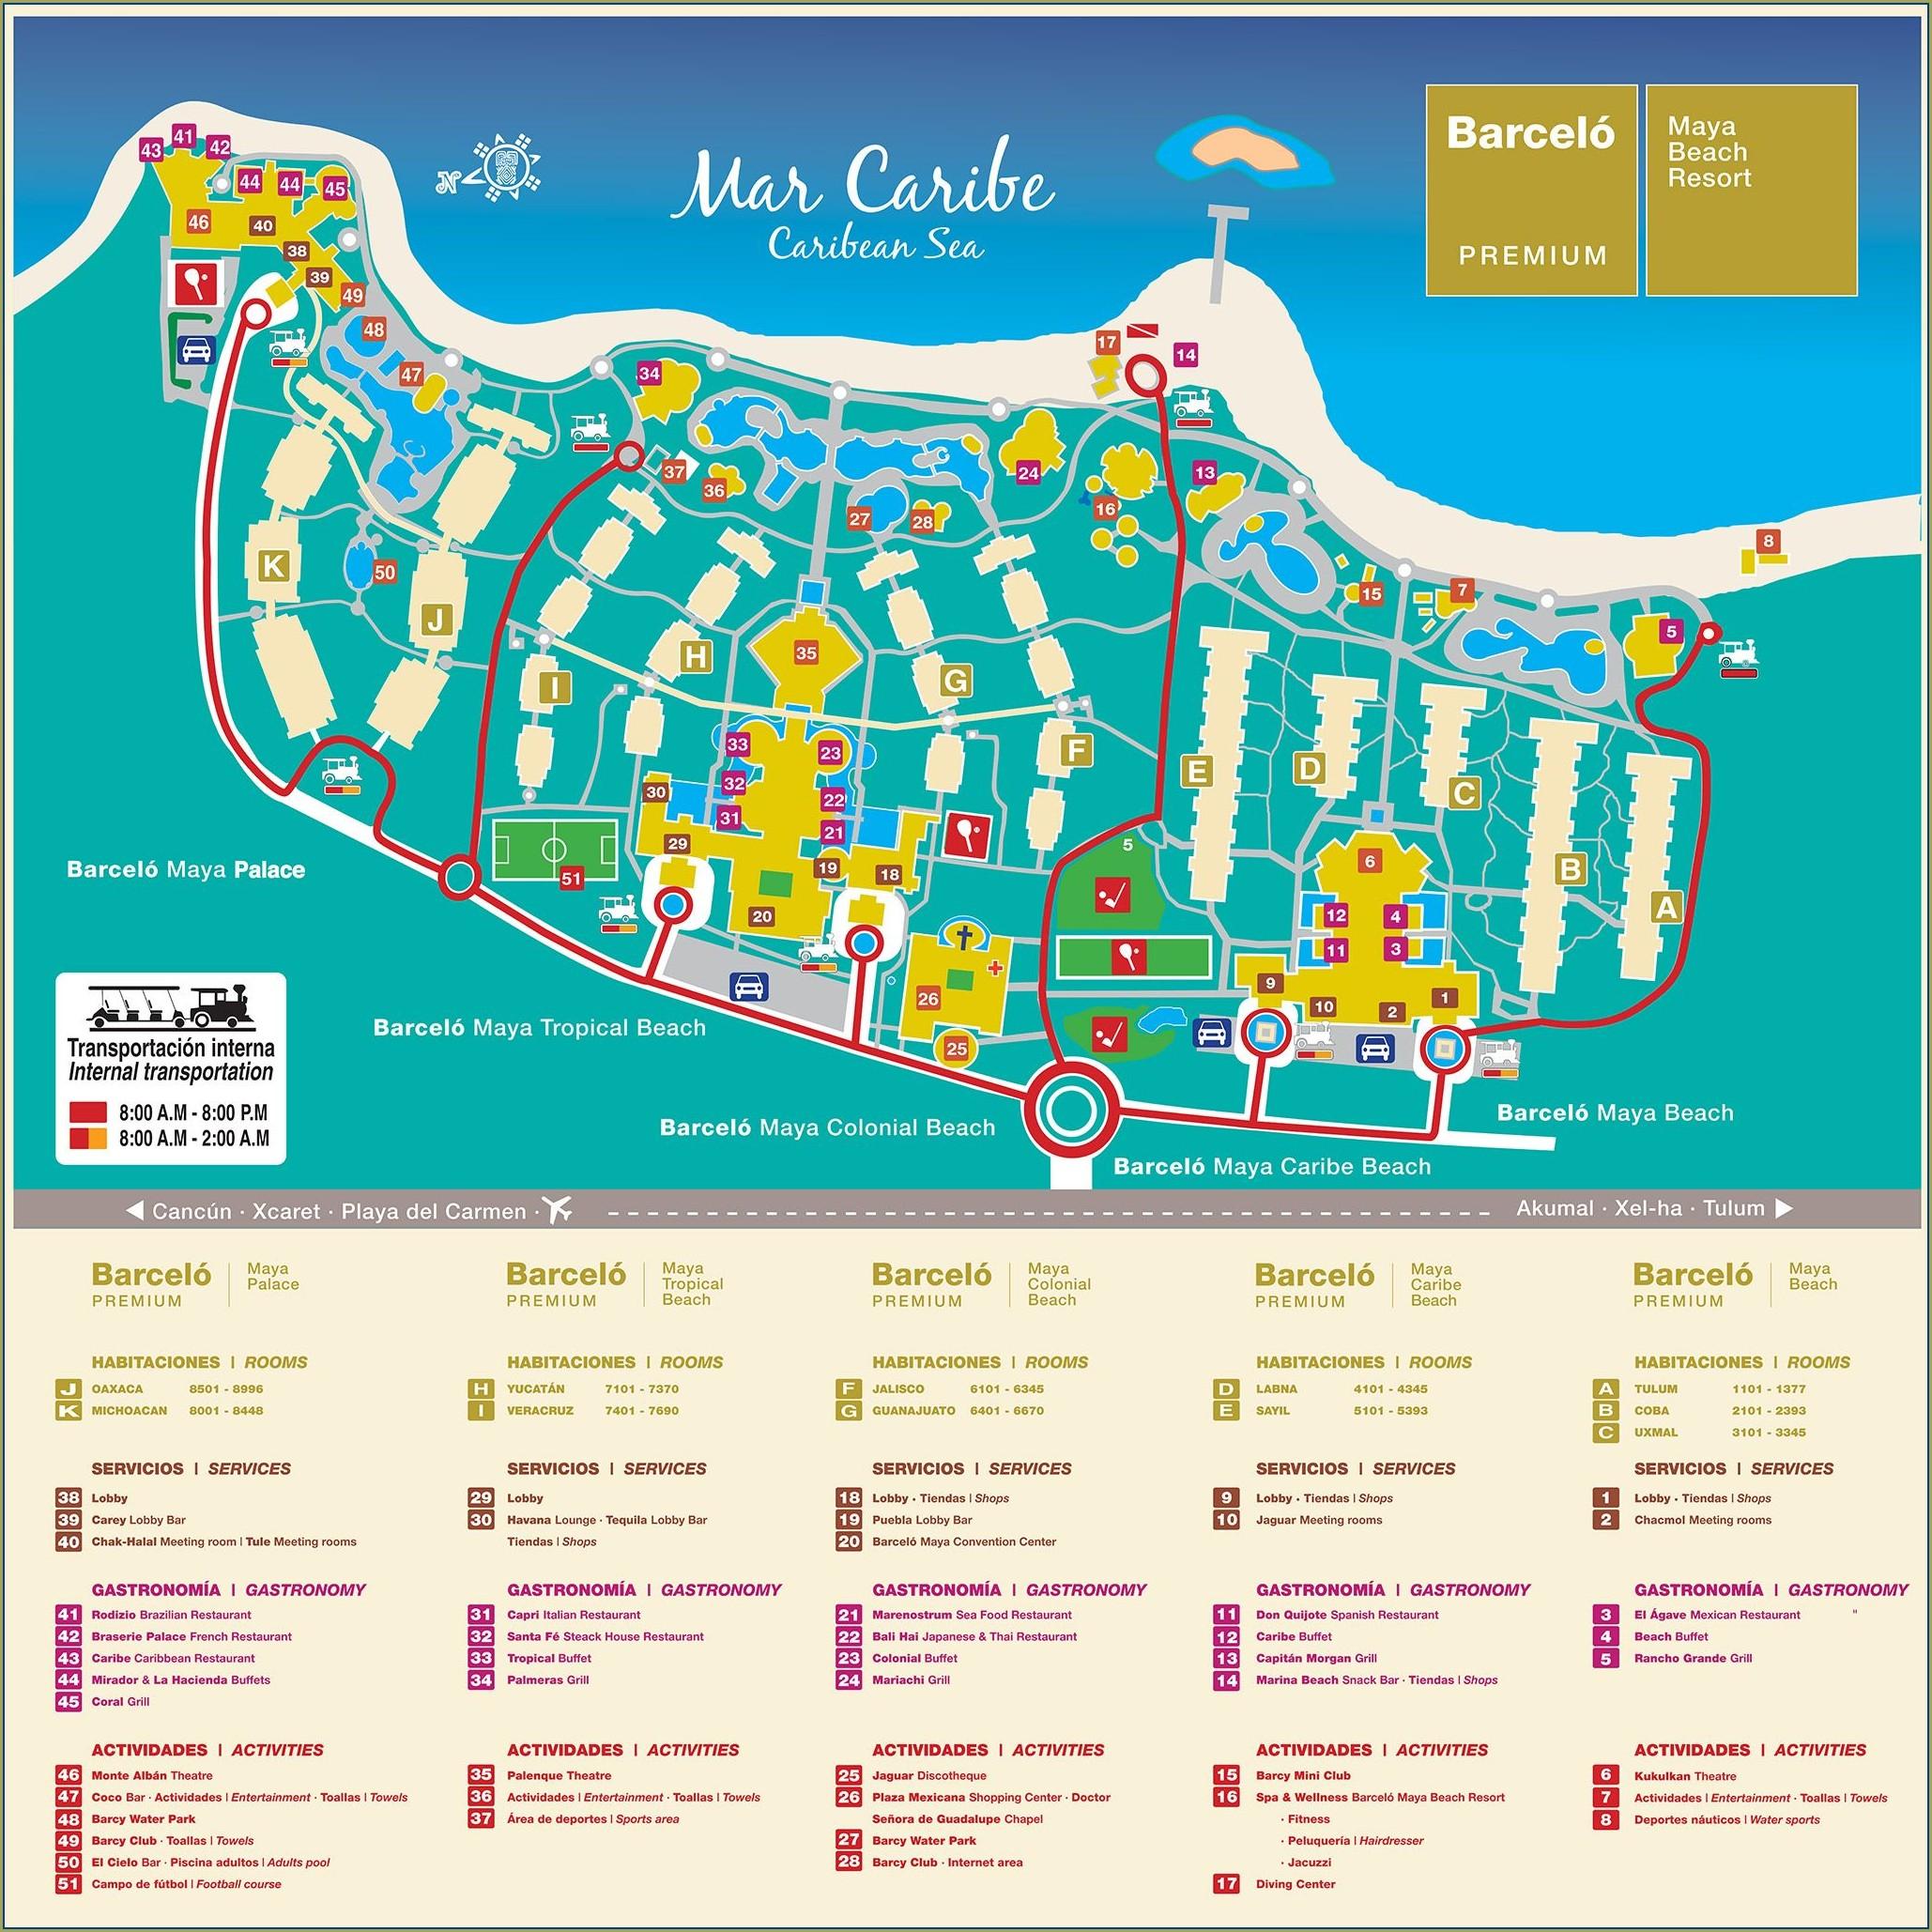 Complejo Barcelo Riviera Maya Mapa